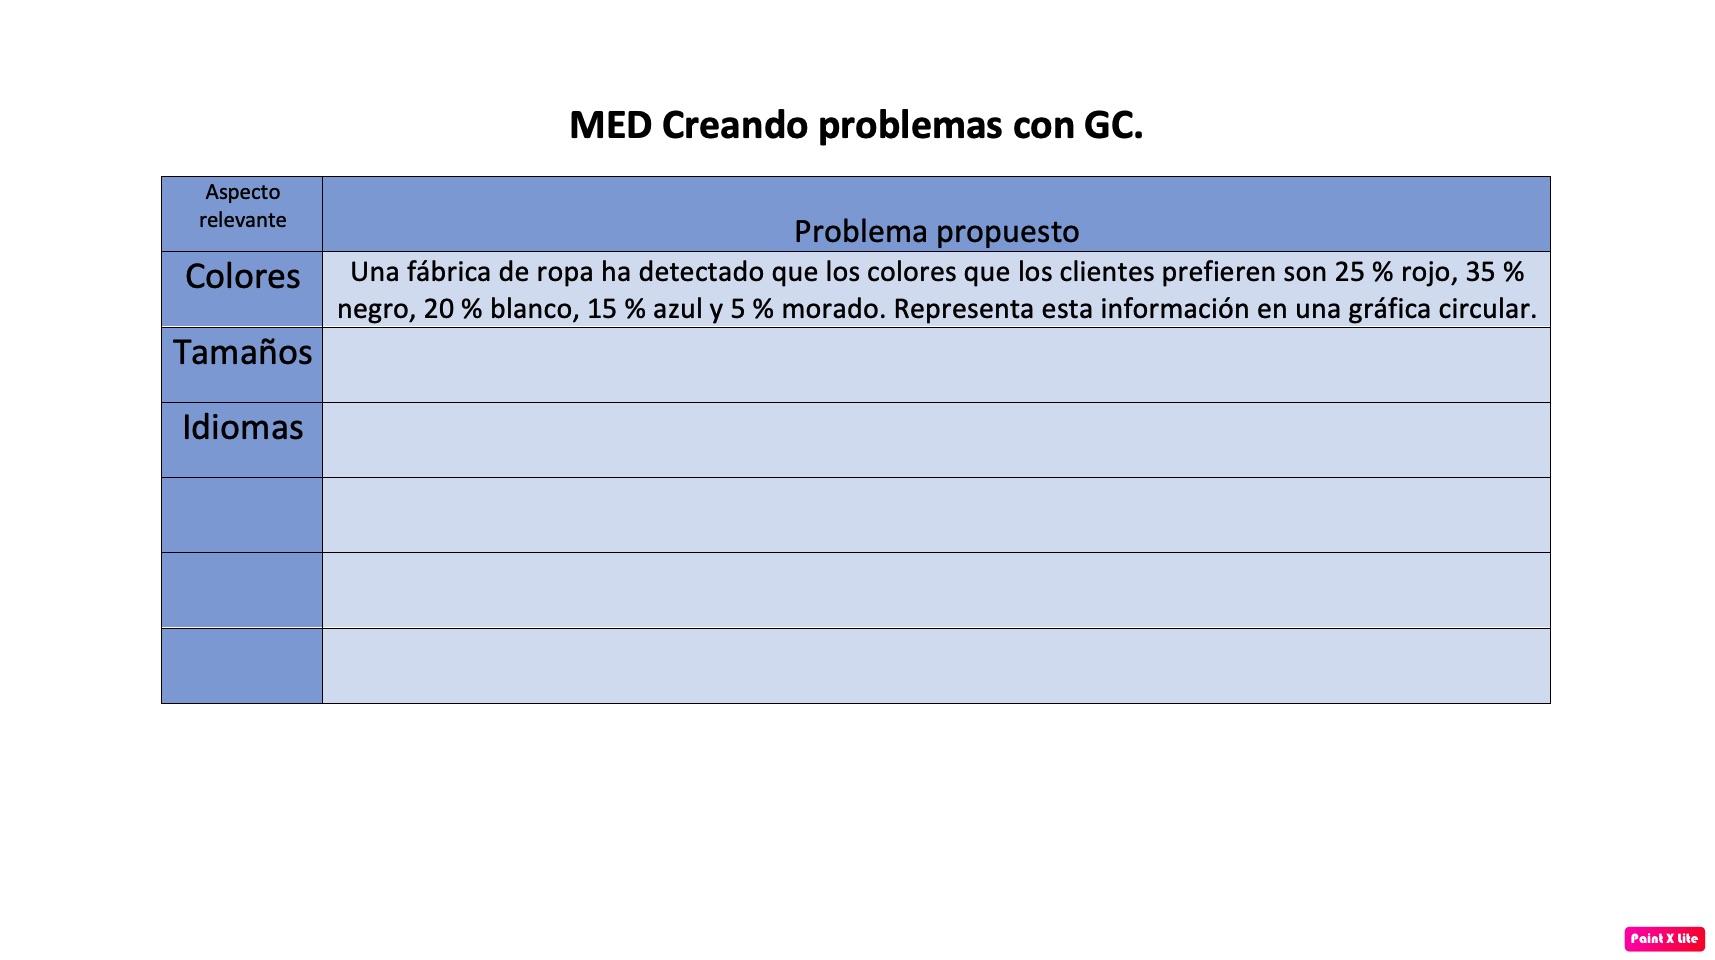 83556113059122891T194202111203_Creando+problemas+con+GC.jpg